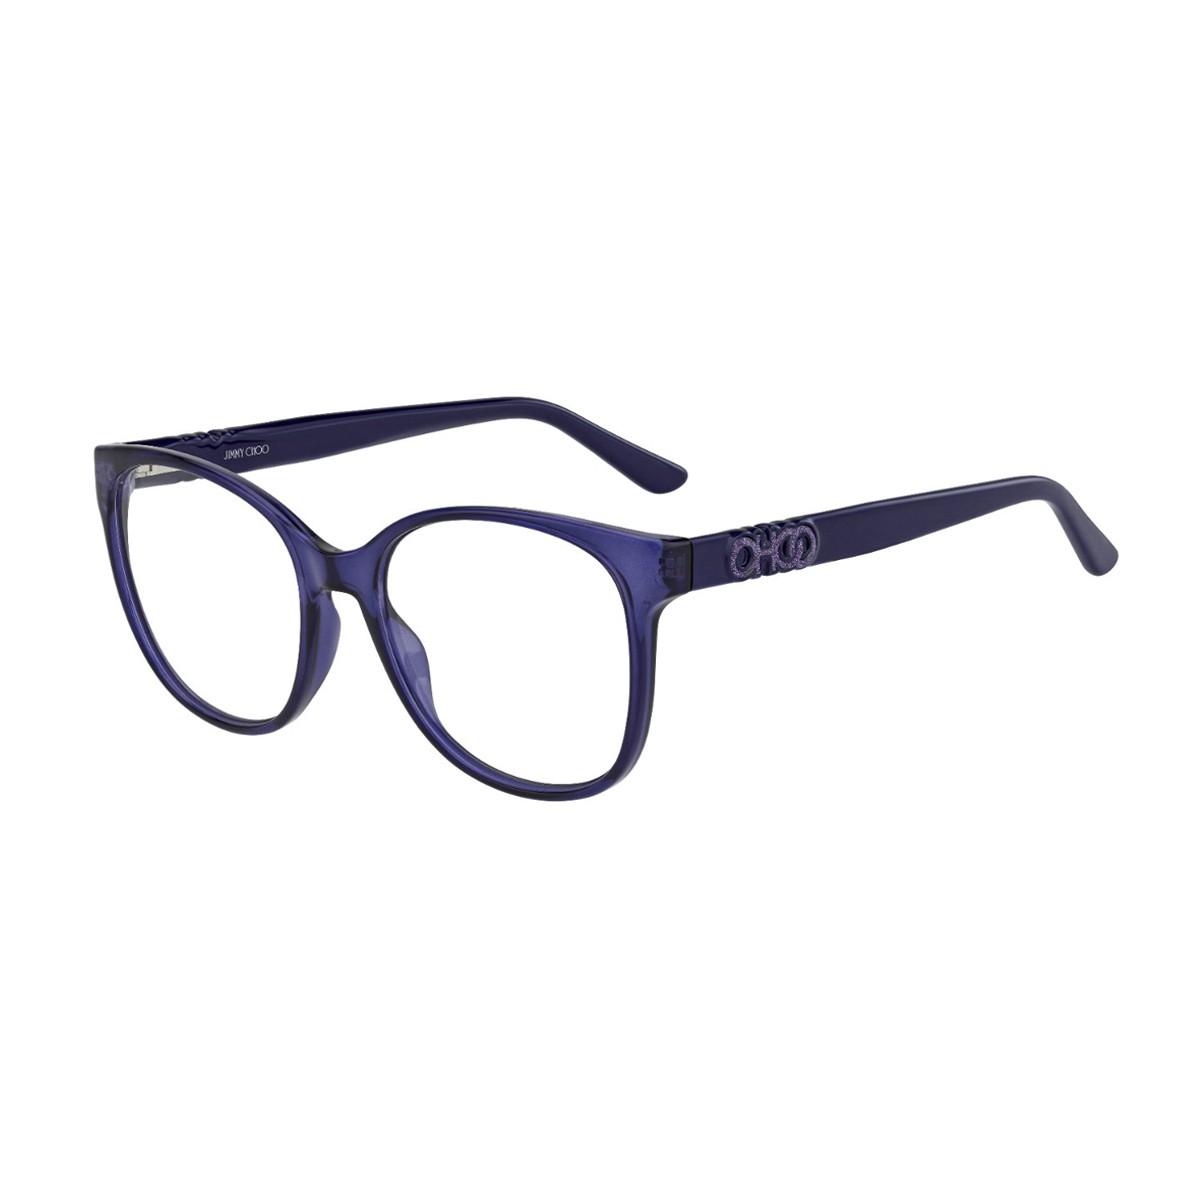 Jimmy Choo Jc242 | Women's eyeglasses